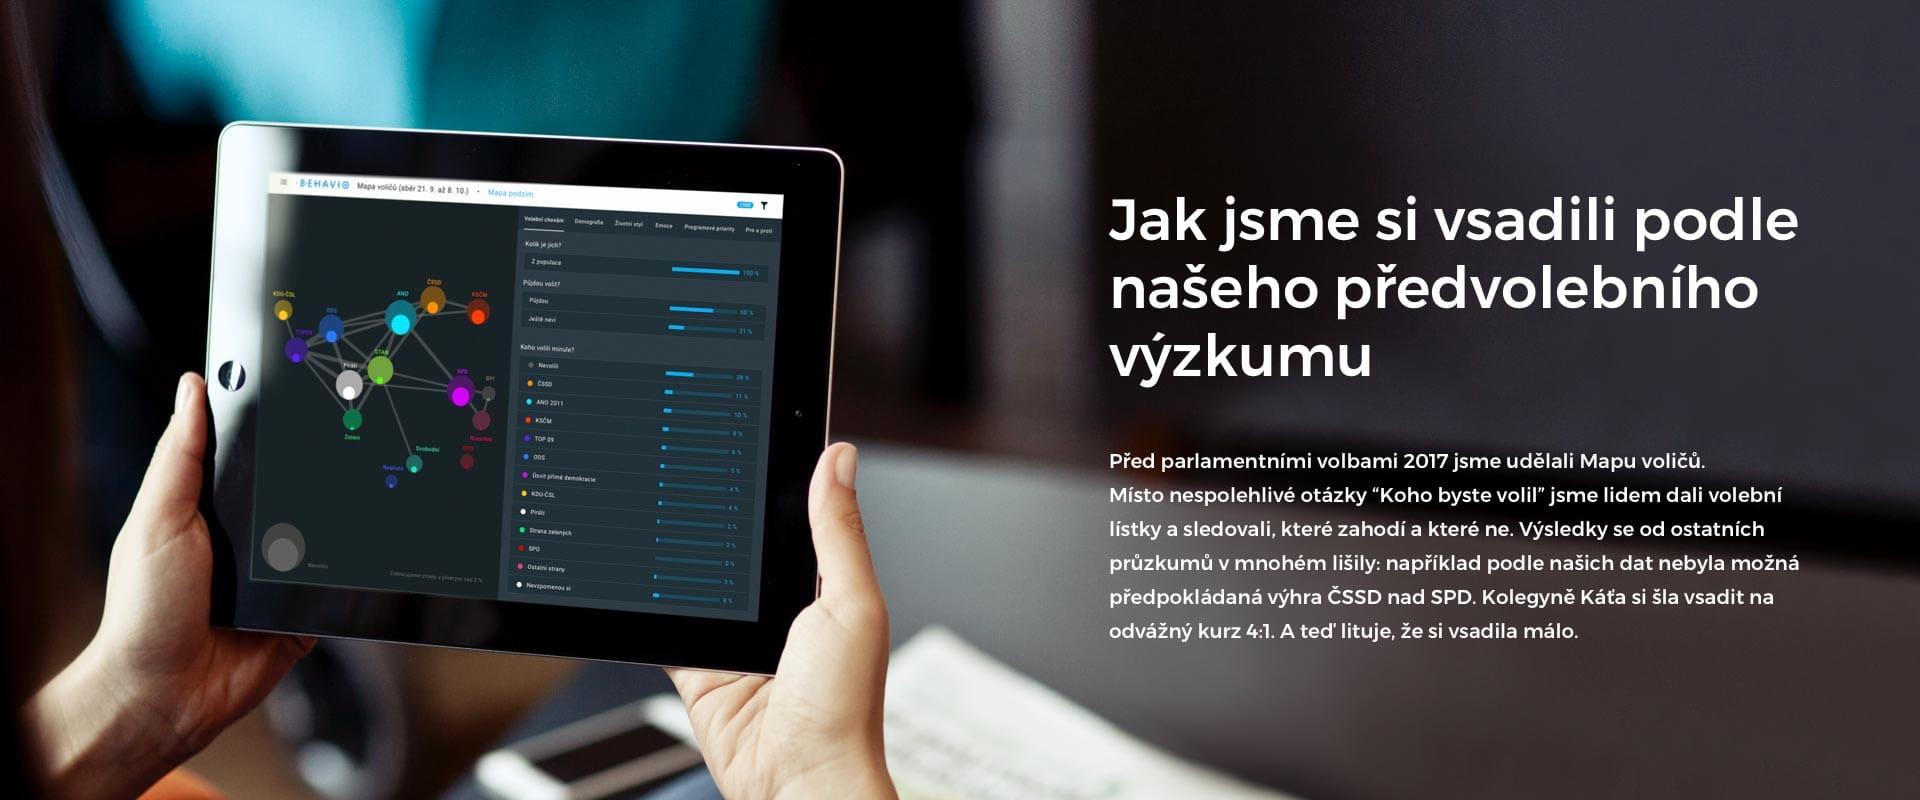 Case_2A_desktop